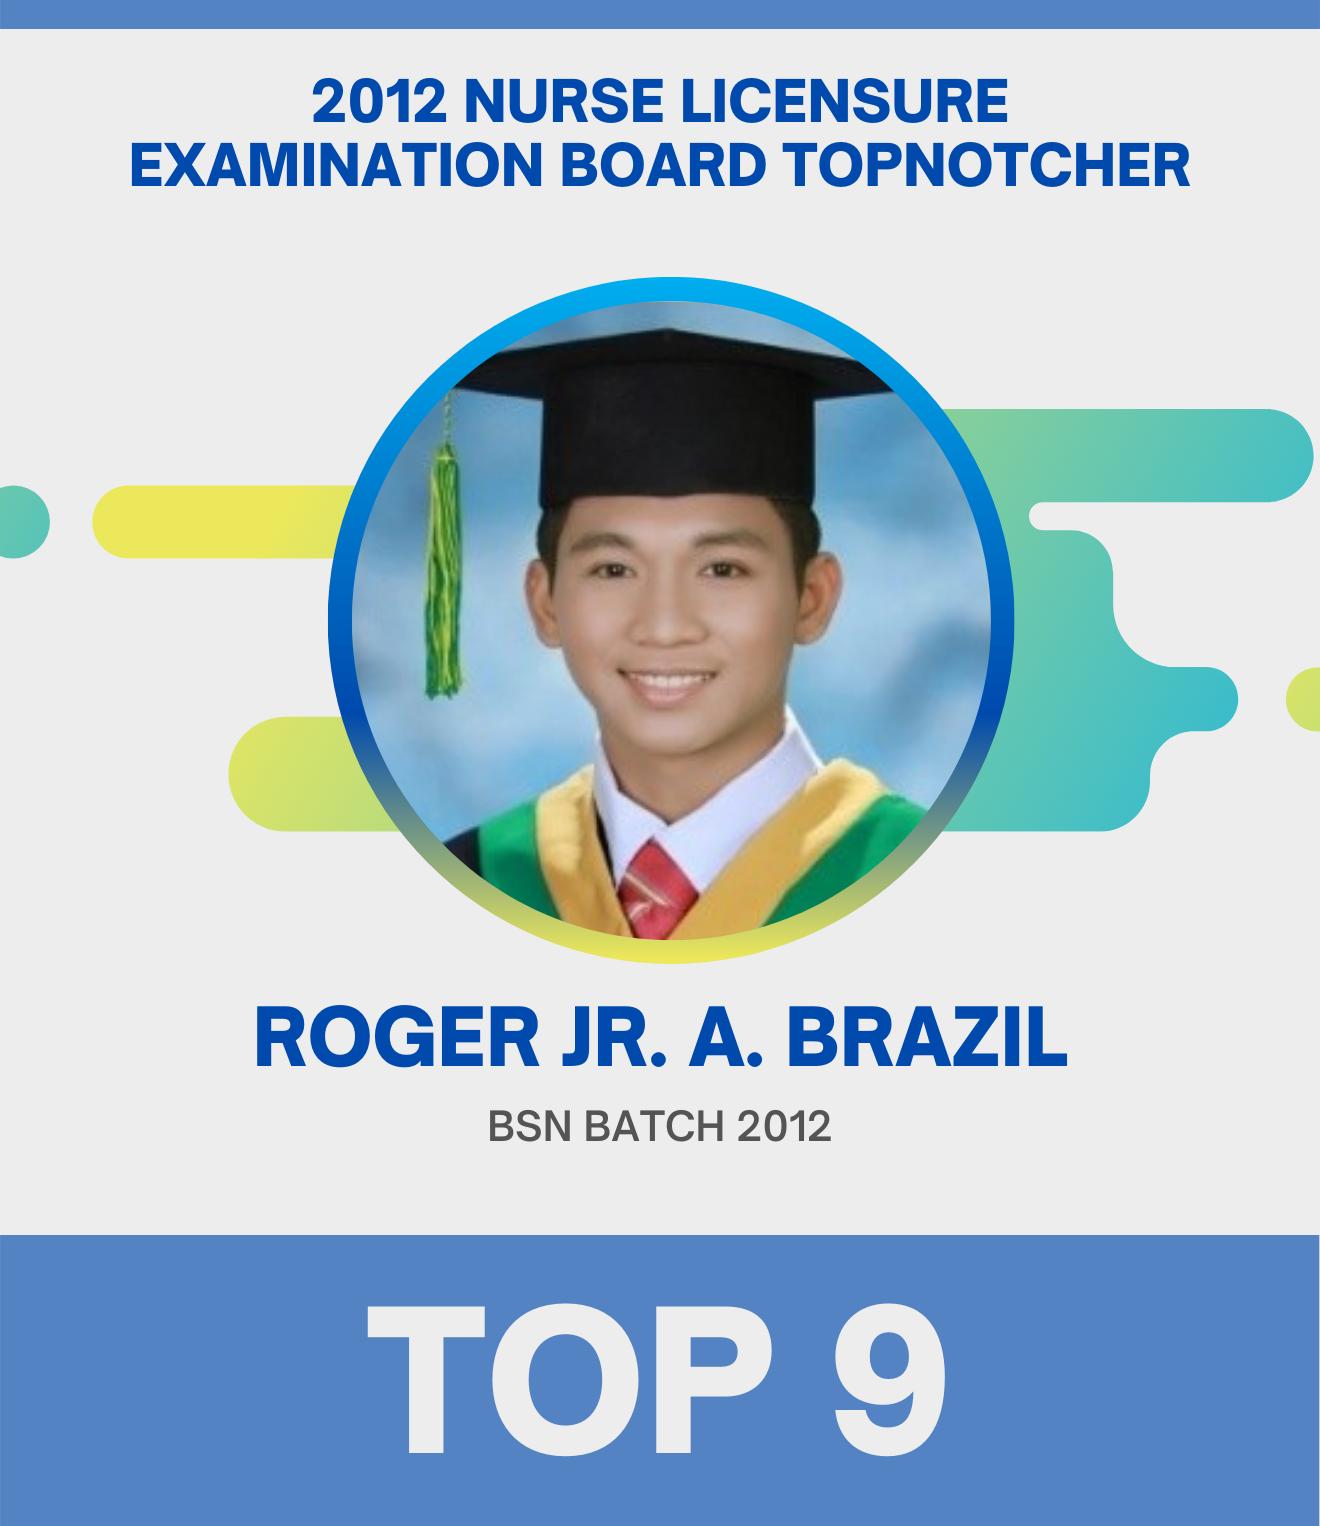 Top 9 - roger jr. a. brazil